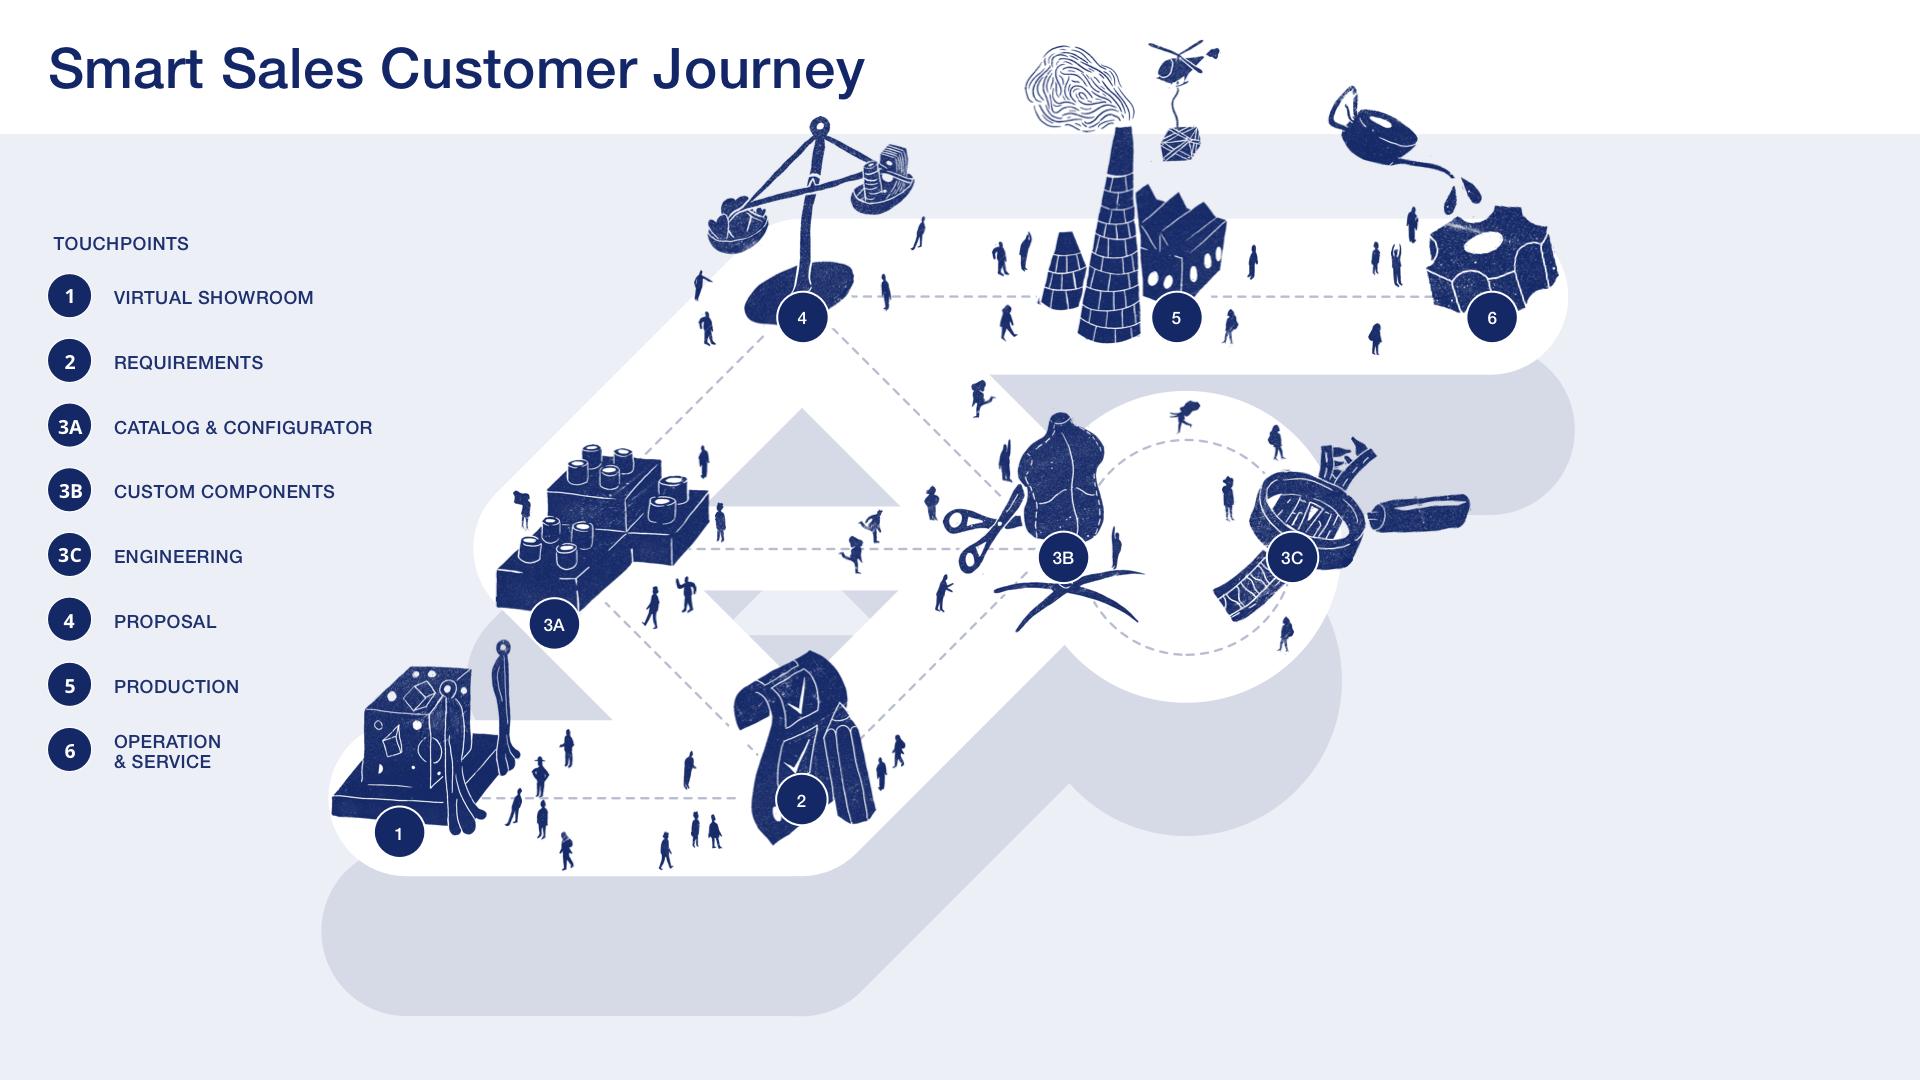 Smart Sales Customer Journey mit Labels